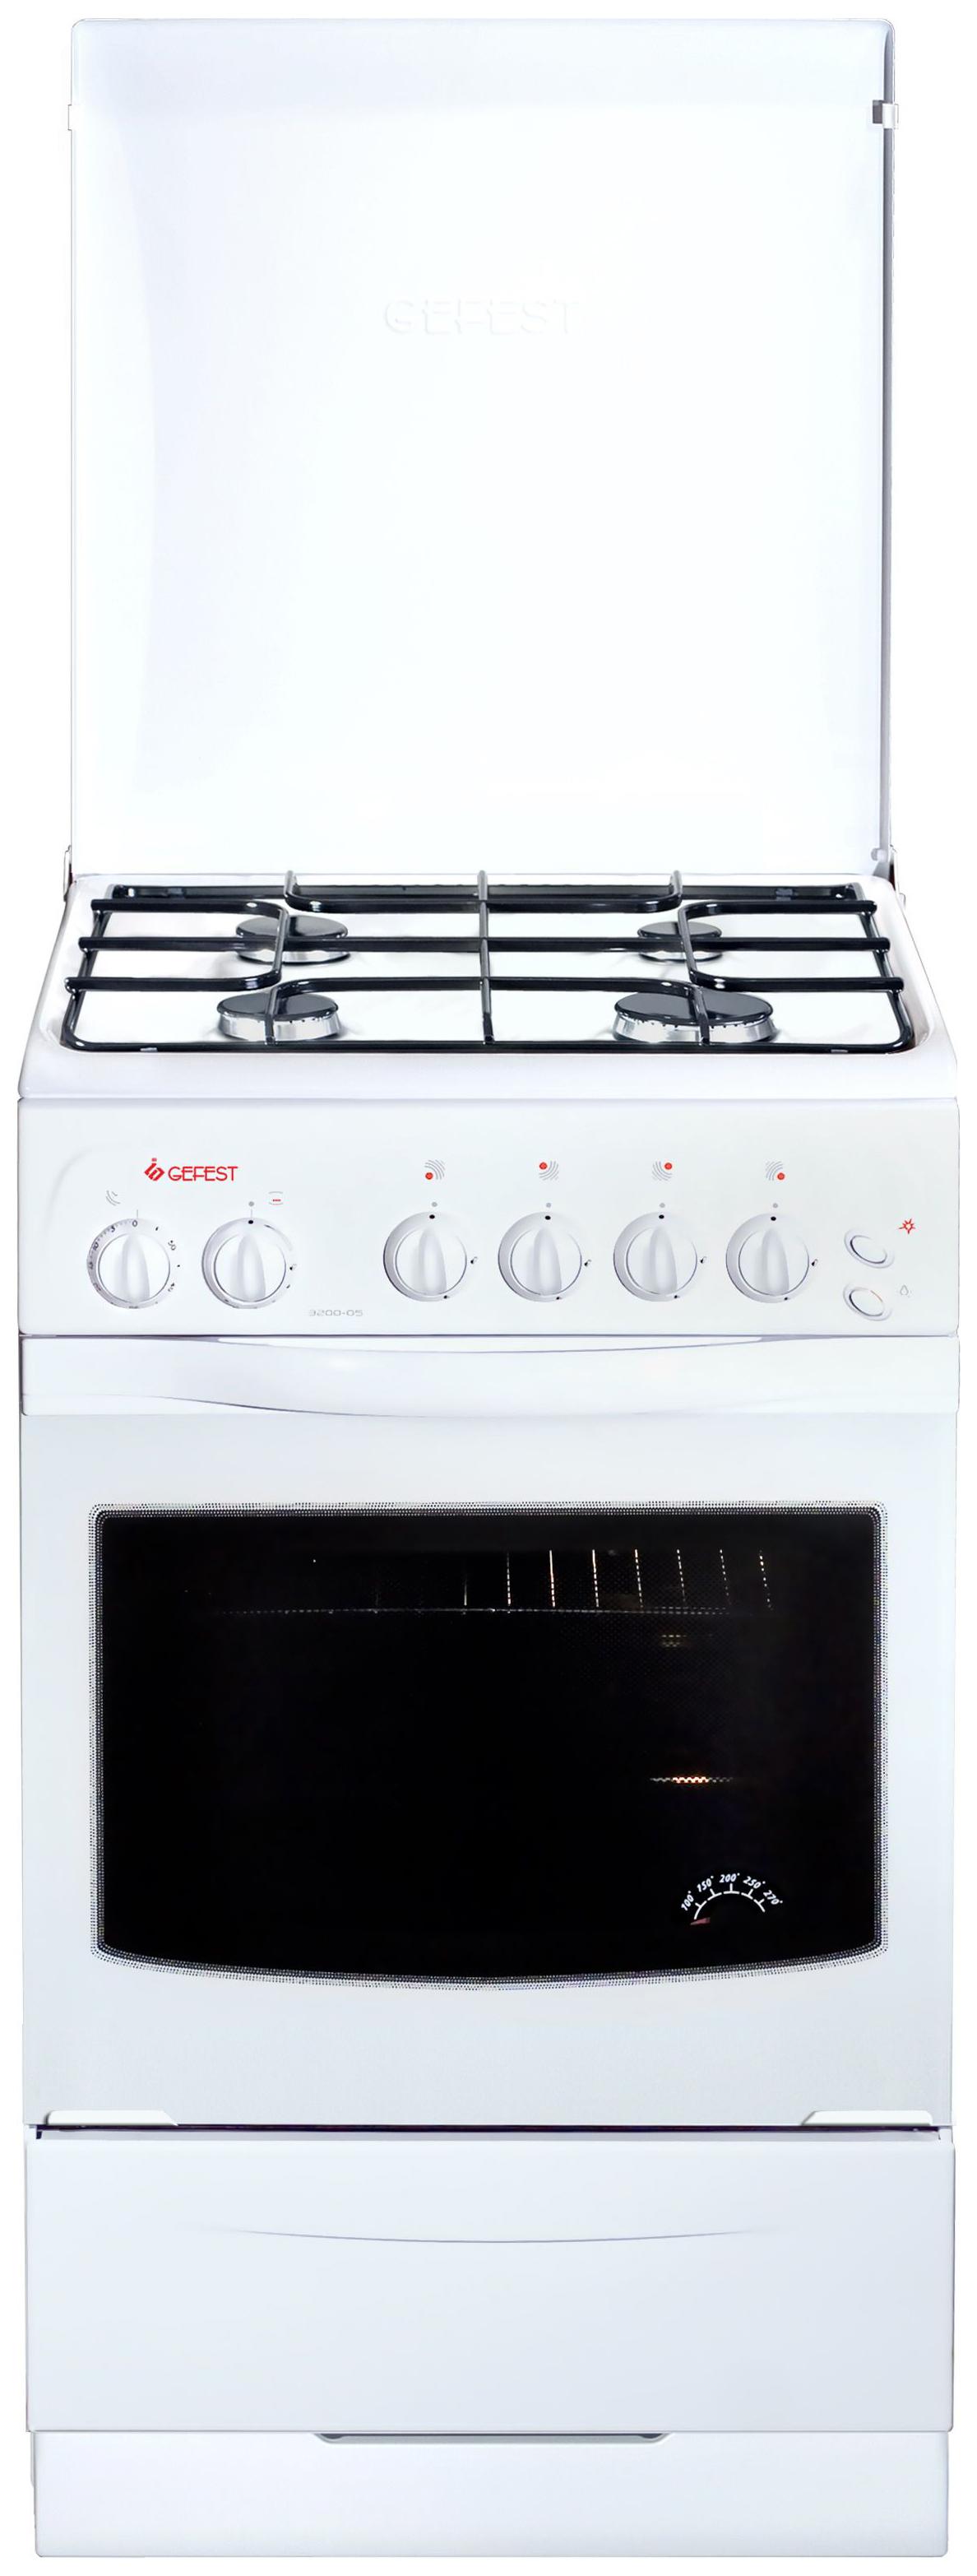 Газовая плита GEFEST ПГ 3200-05 White фото